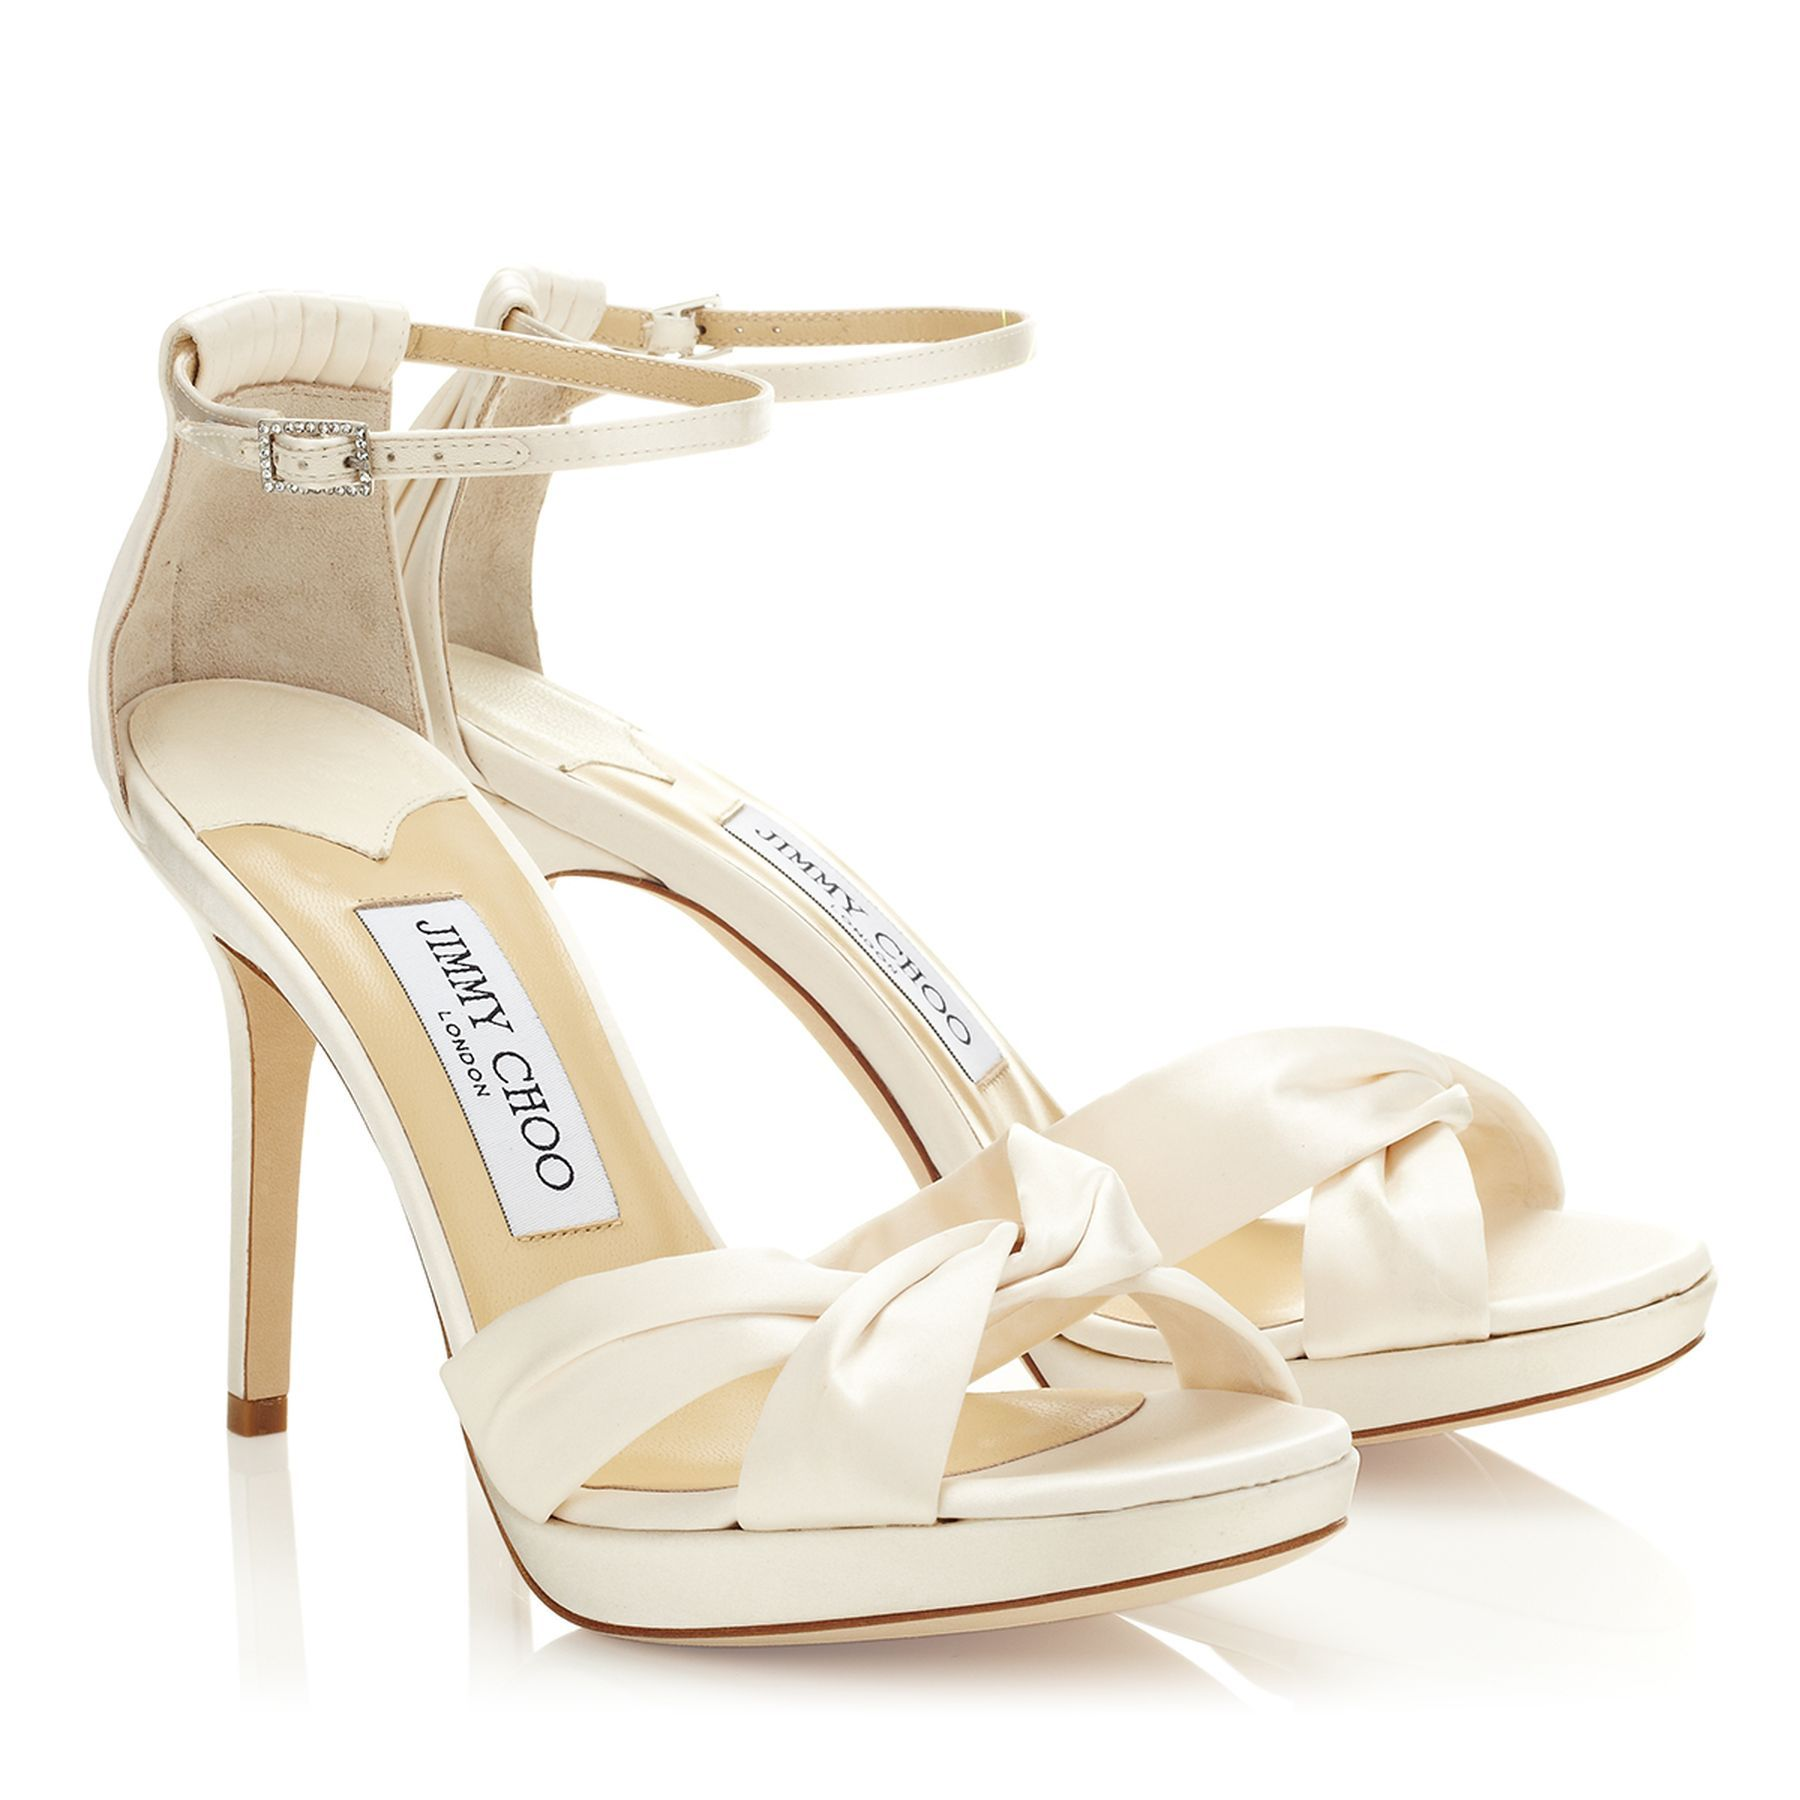 9d0b48e9665 Fashionable Ivory Satin Platform Sandals